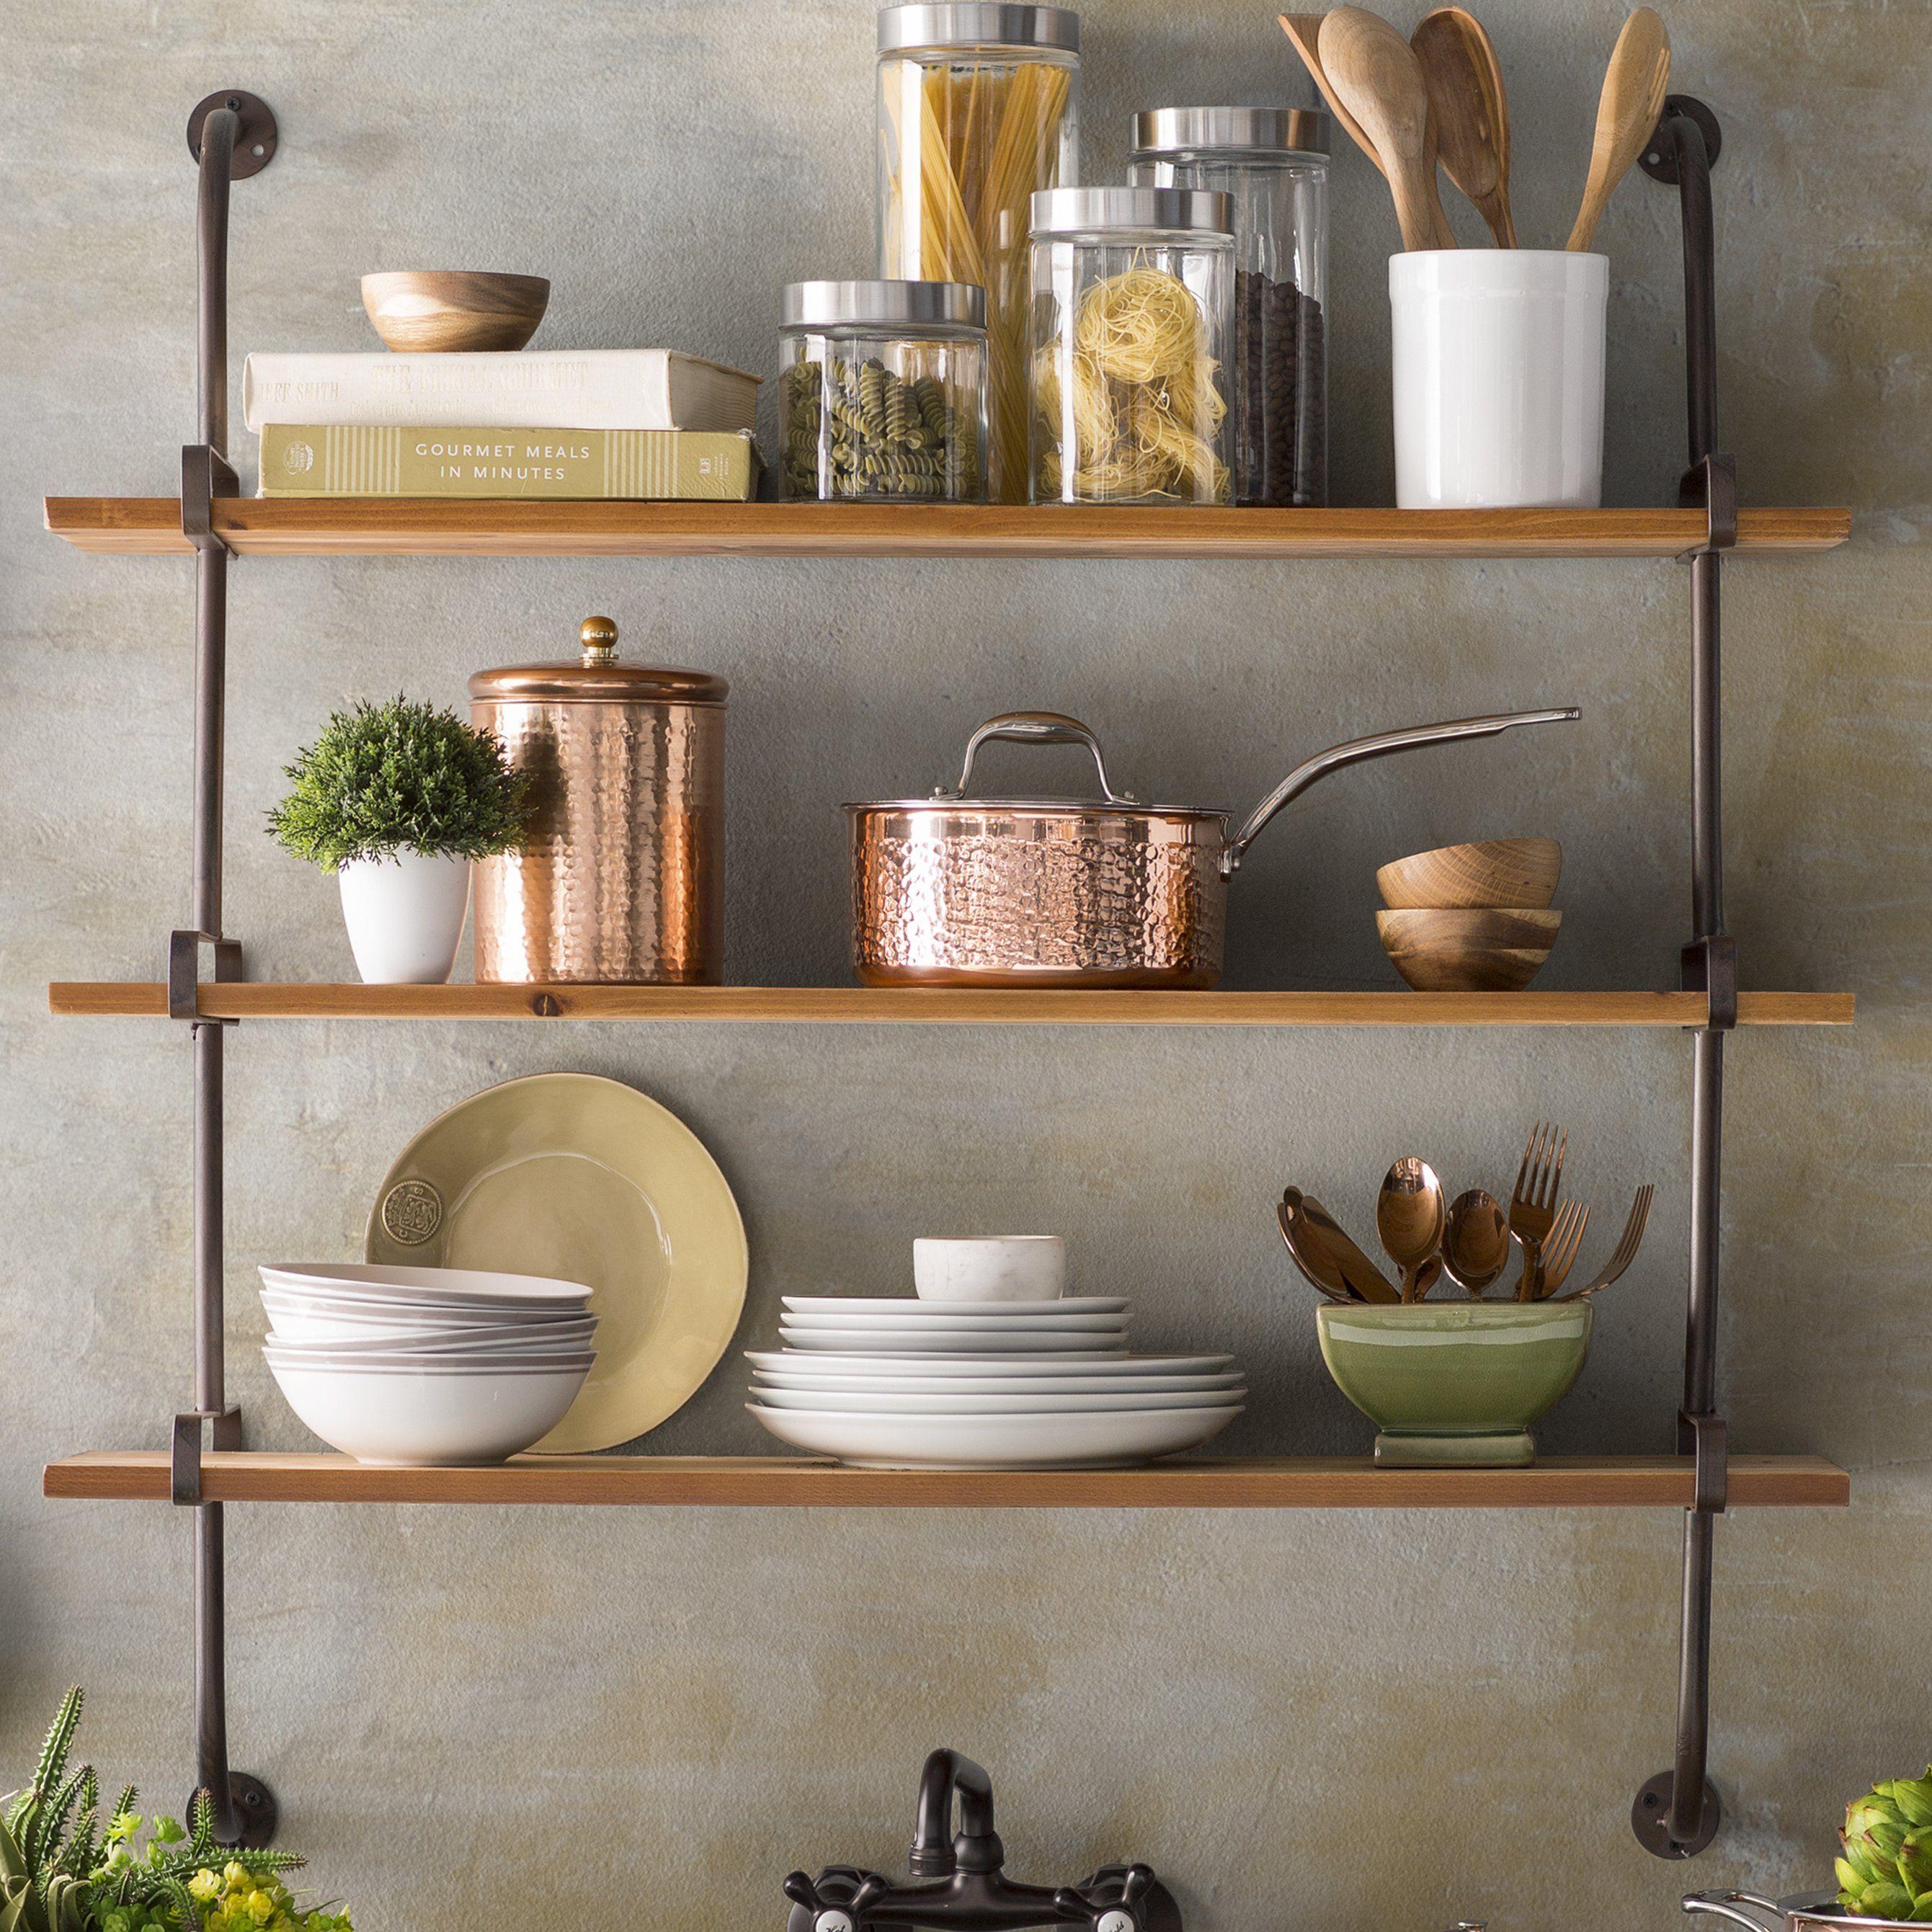 kitchen wall shelves - 736×736